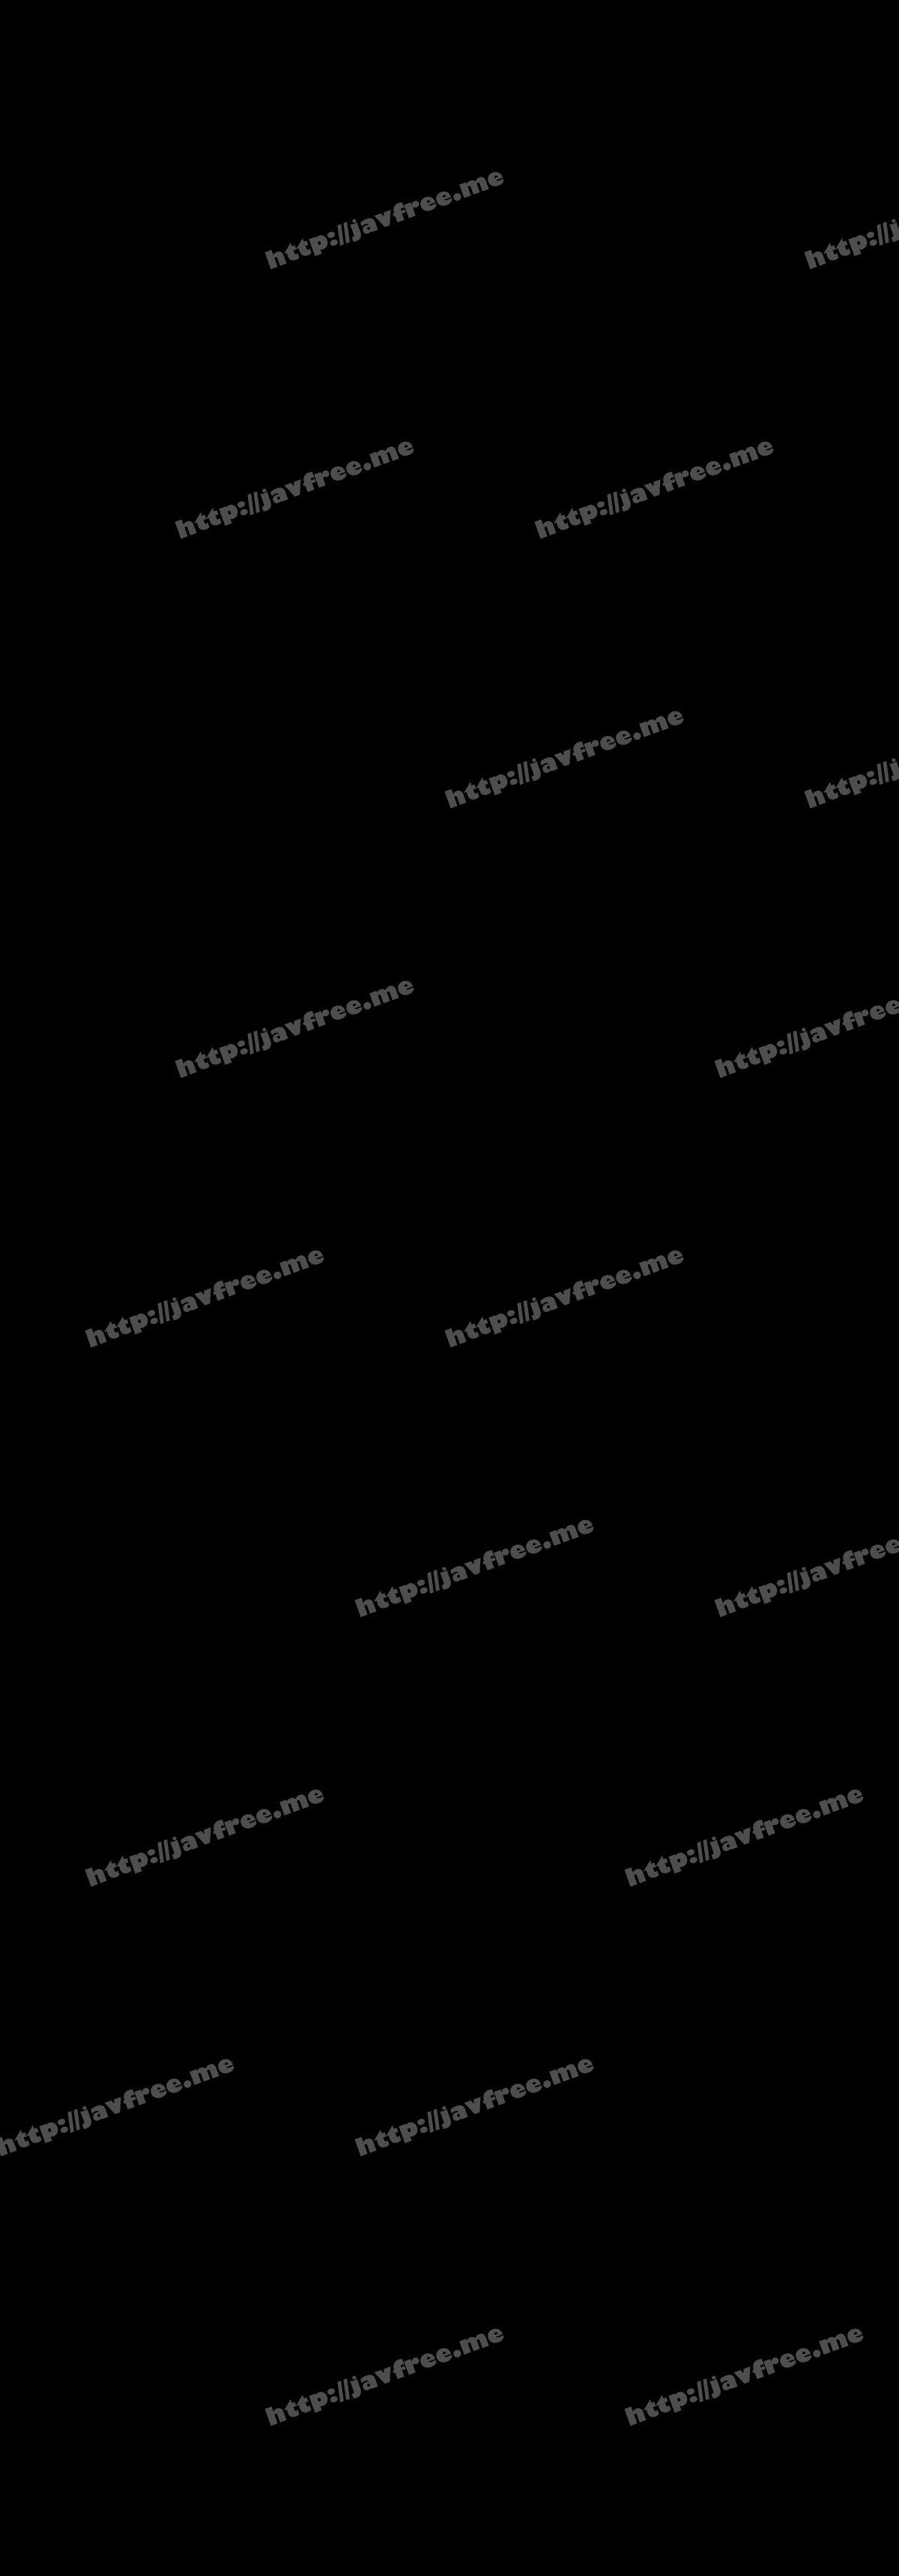 [NNPJ-335] 身長175cm!股下83.5cm!インカレ常連の強豪大学に通う長身美脚の現役バレーボール選手さおりちゃんをナンパ隠し撮りそのままAV発売。 ナンパJAPAN EXPRESS Vol.103 - image heyzo_hd_1975_full on https://javfree.me